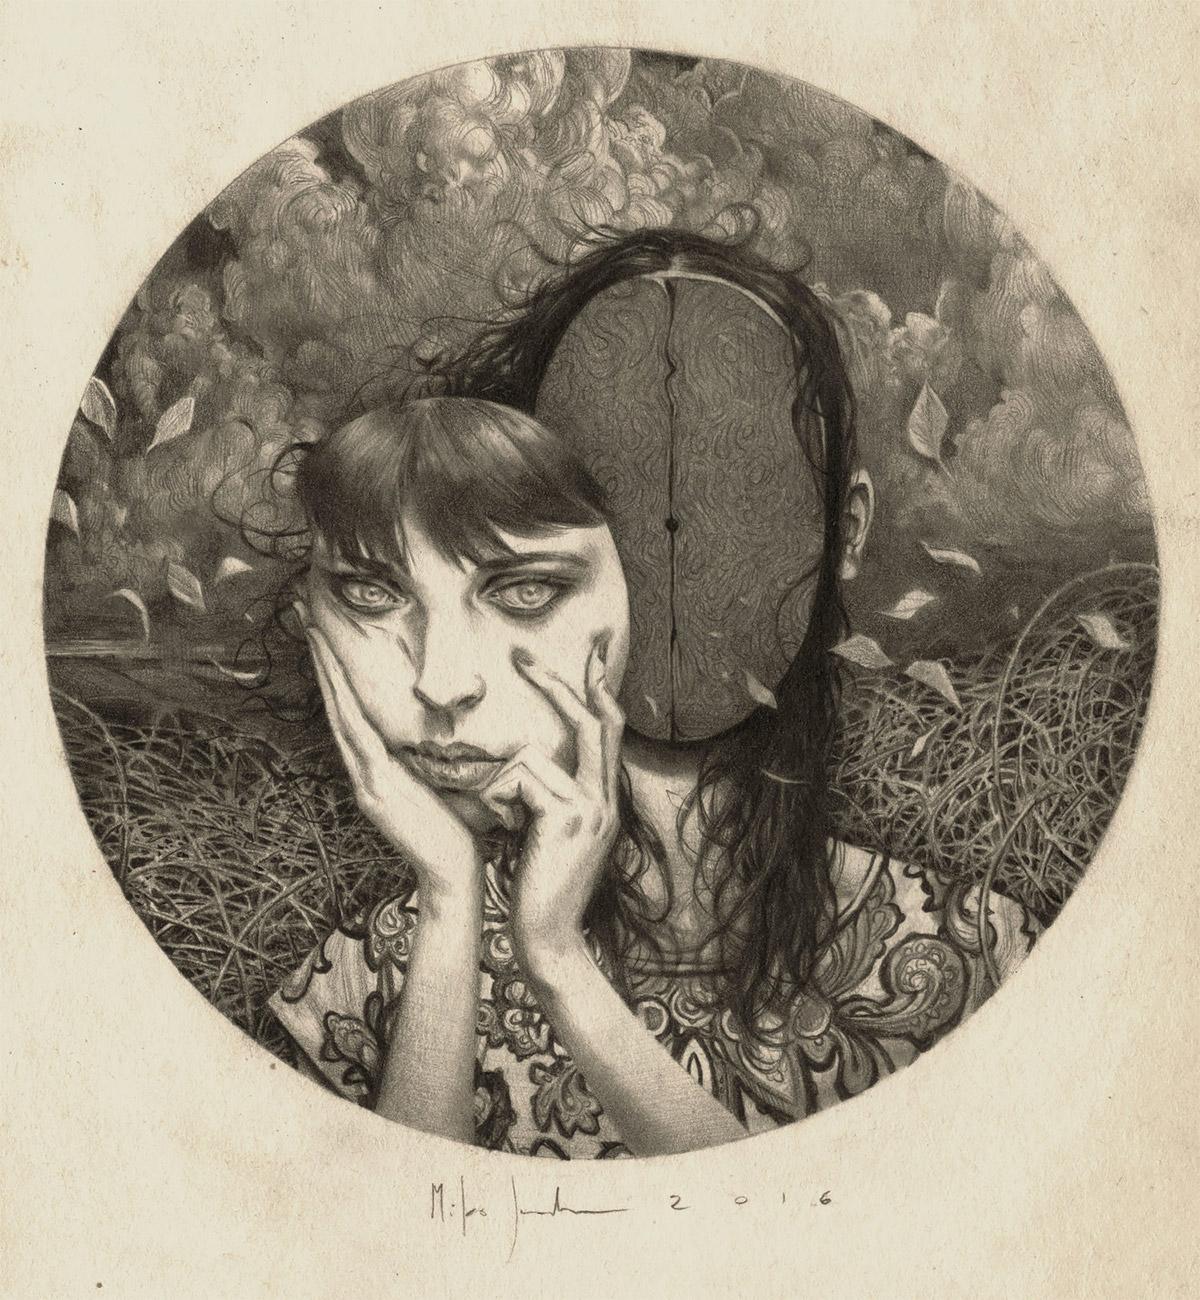 Miles Johnston超现实女孩素描肖像画